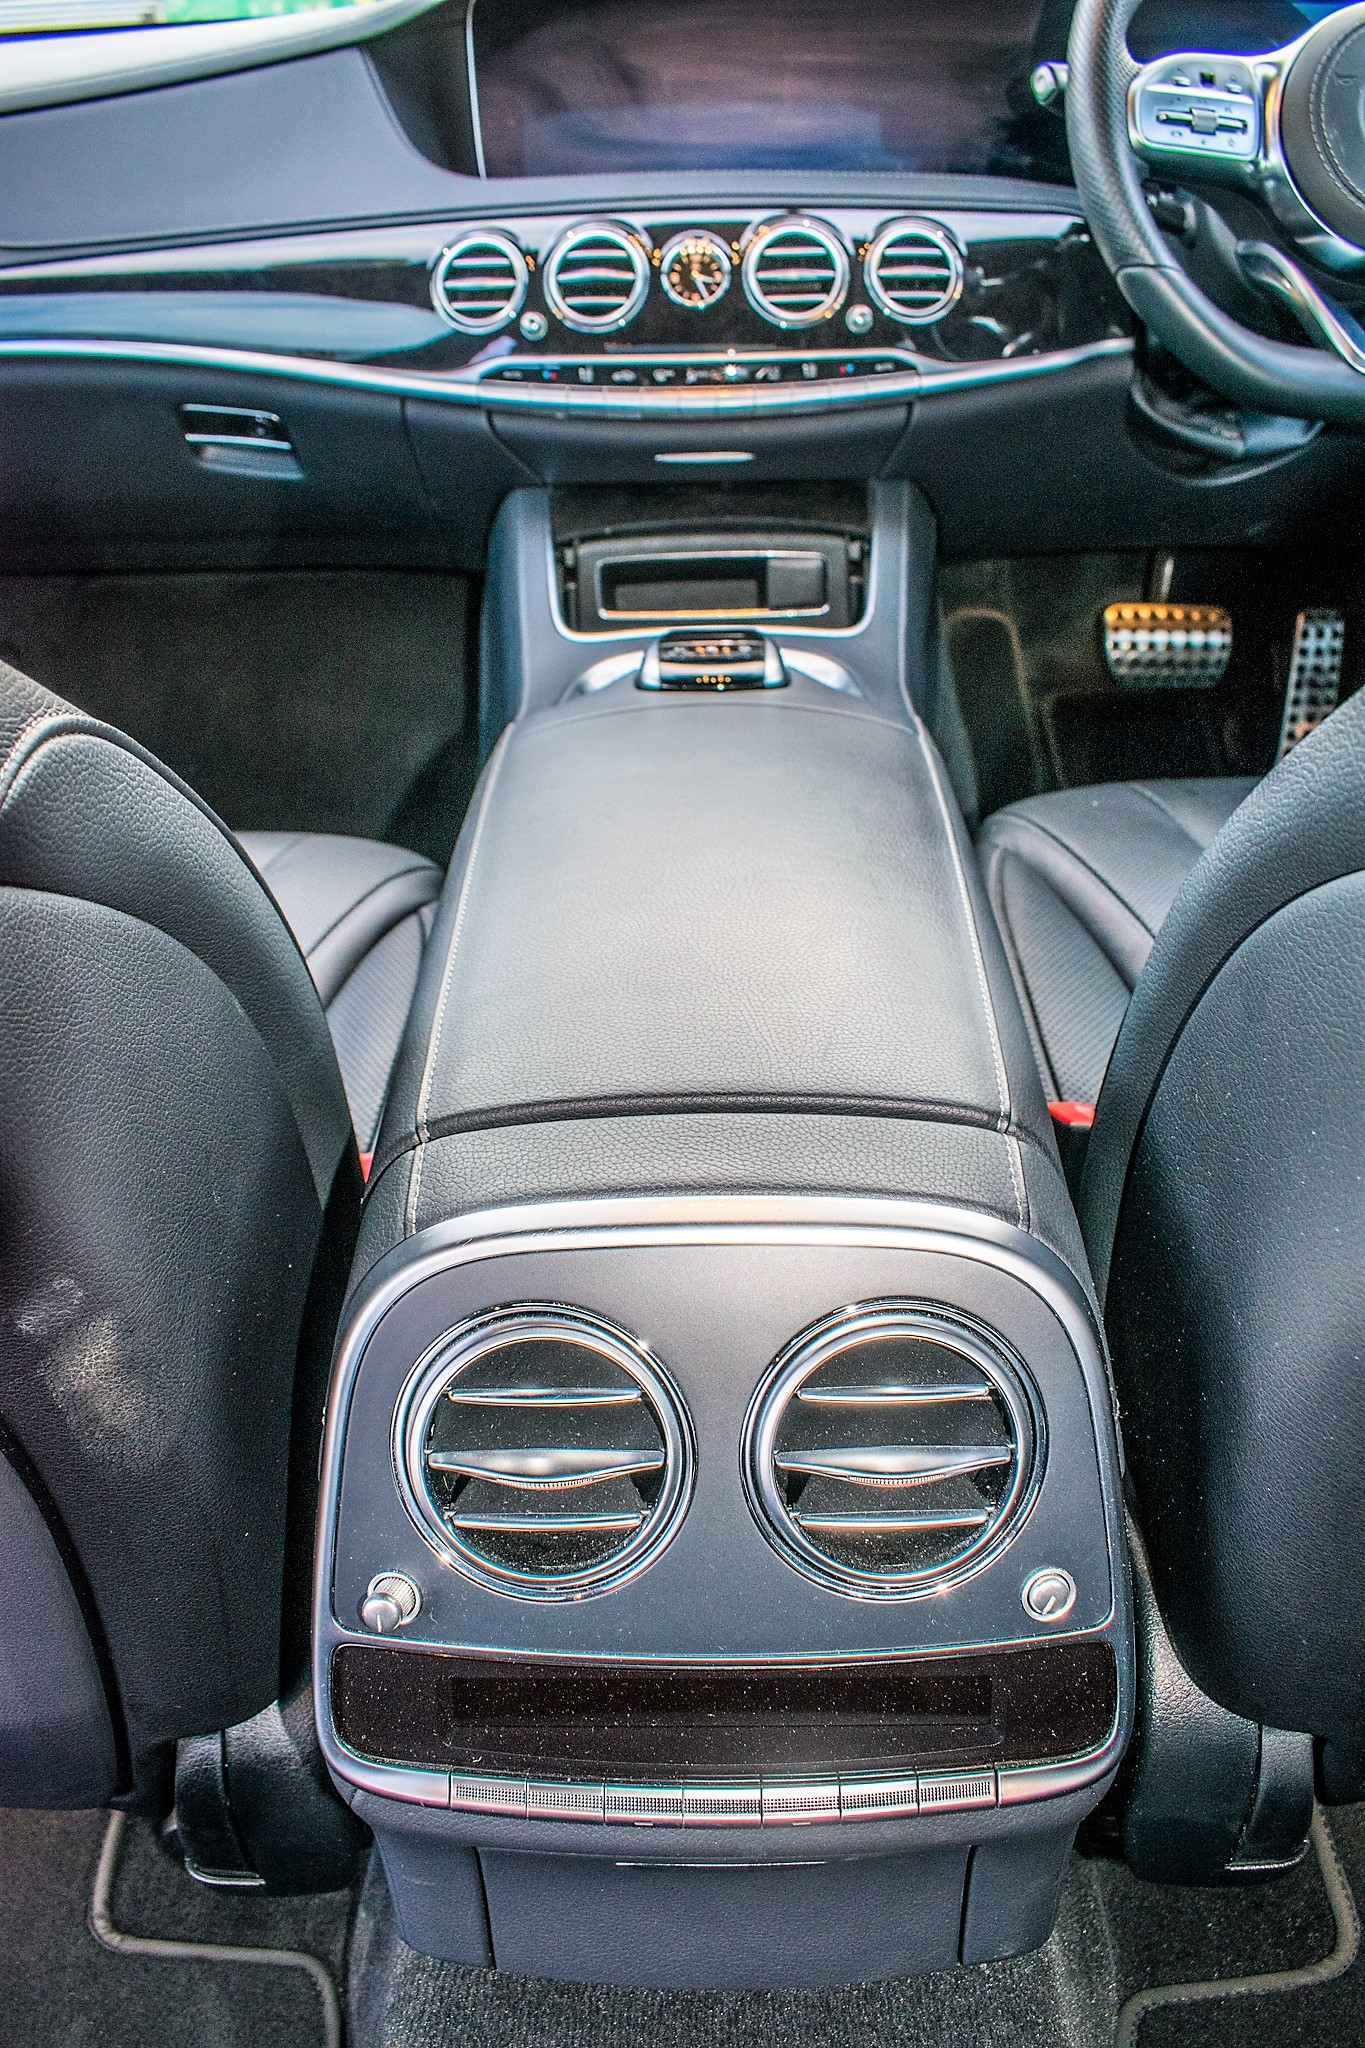 Mercedes Benz S450 L AMG Line Executive auto petrol 4 door saloon car Registration Number: FX68 - Image 26 of 33